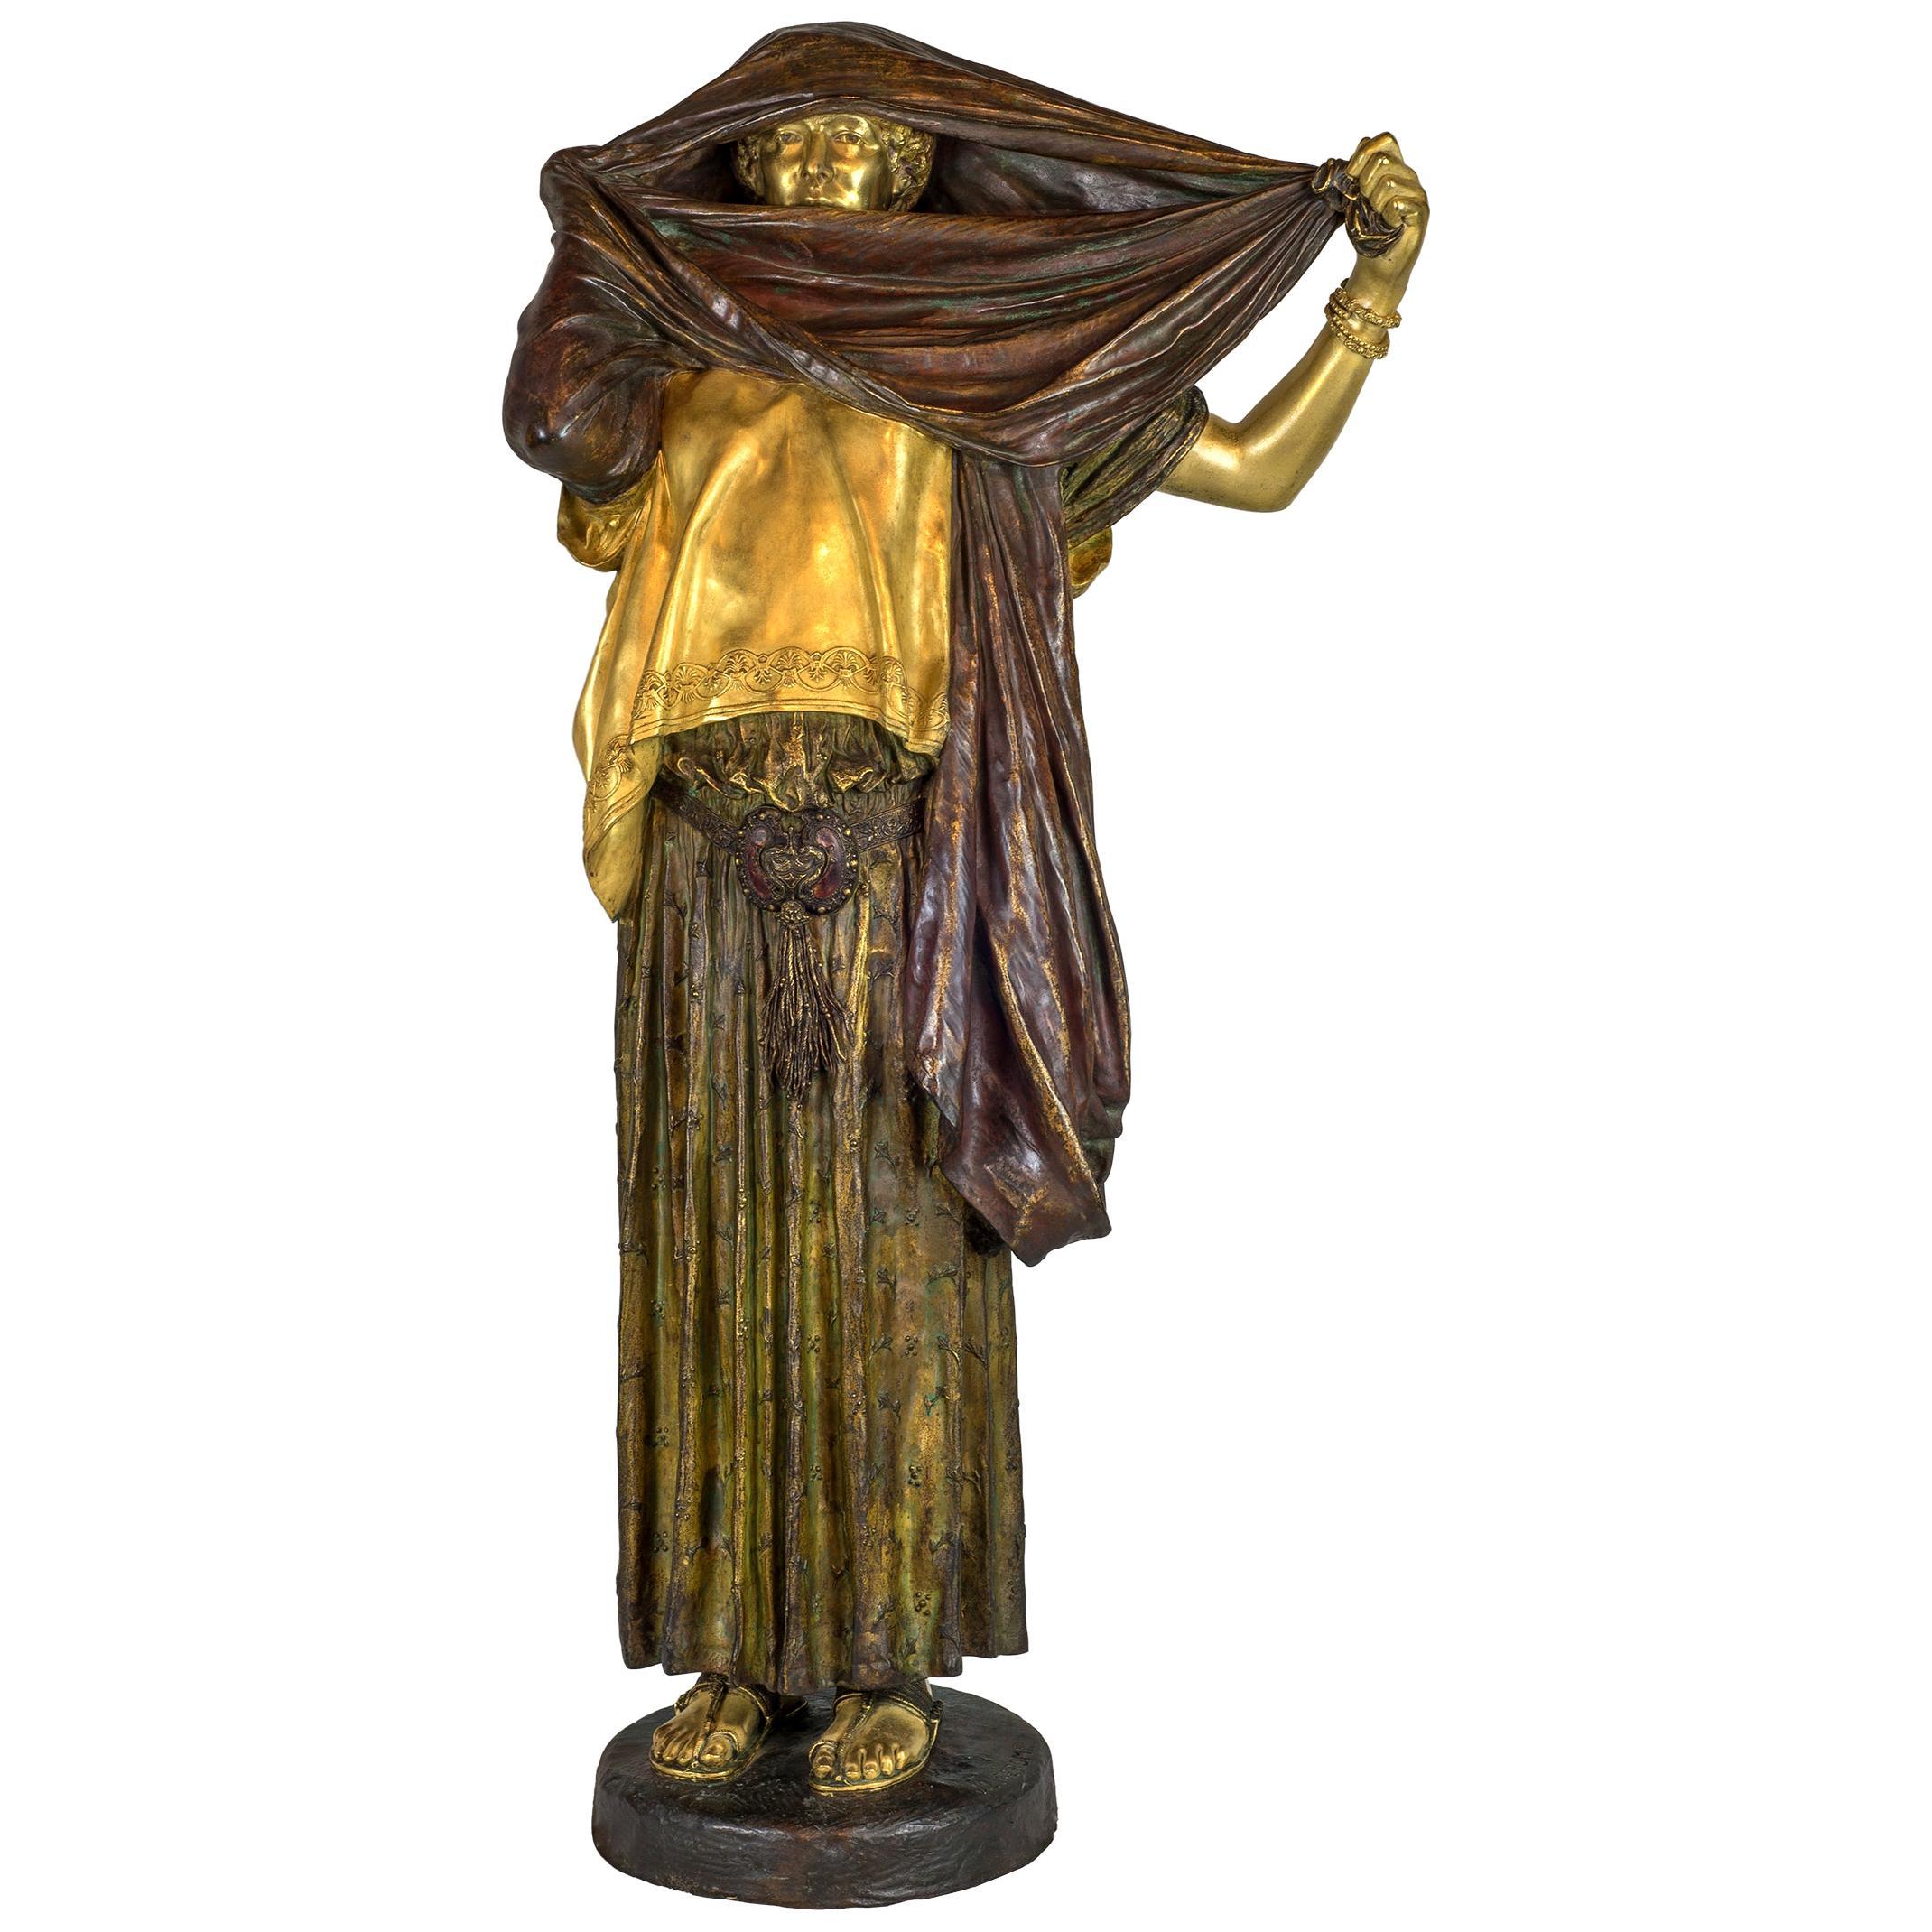 Jean Leon Gerome Orientalist Gilt and Polychrome-Patinated Bronze Sculpture